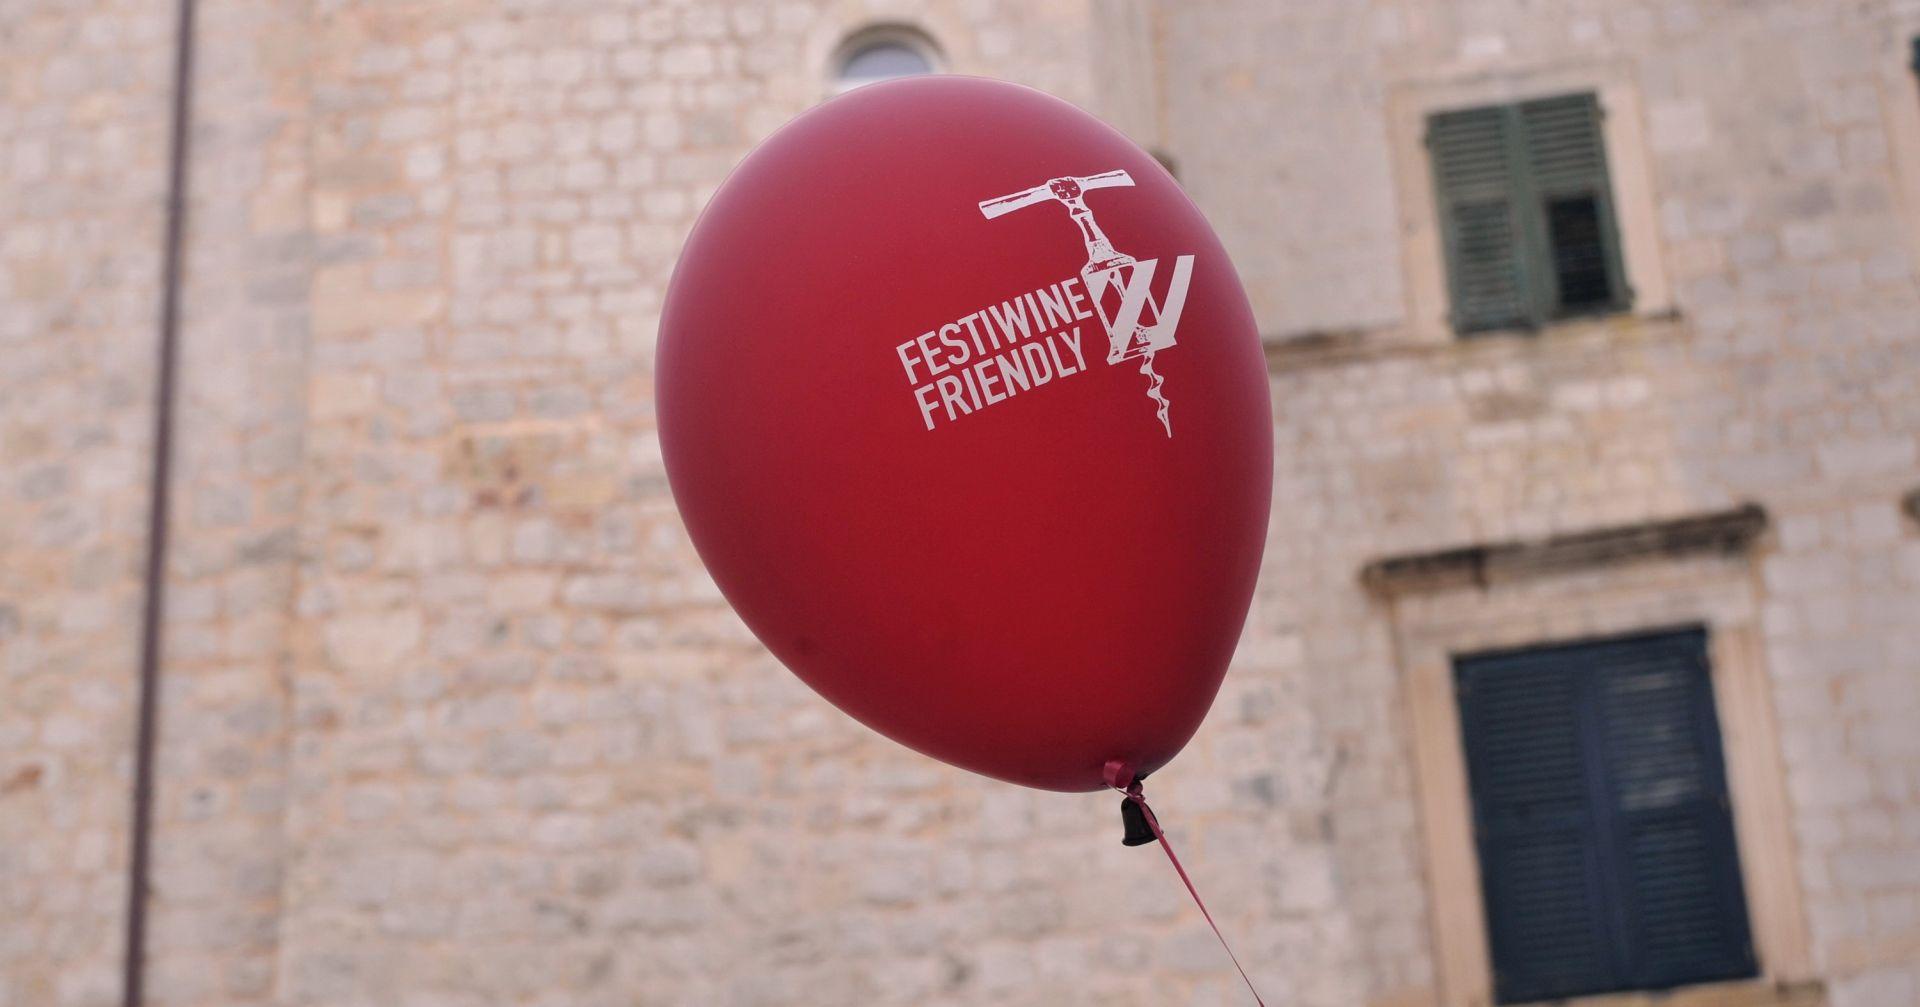 Završeno 5. izdanje vinskog festivala Dubrovnik Festiwine